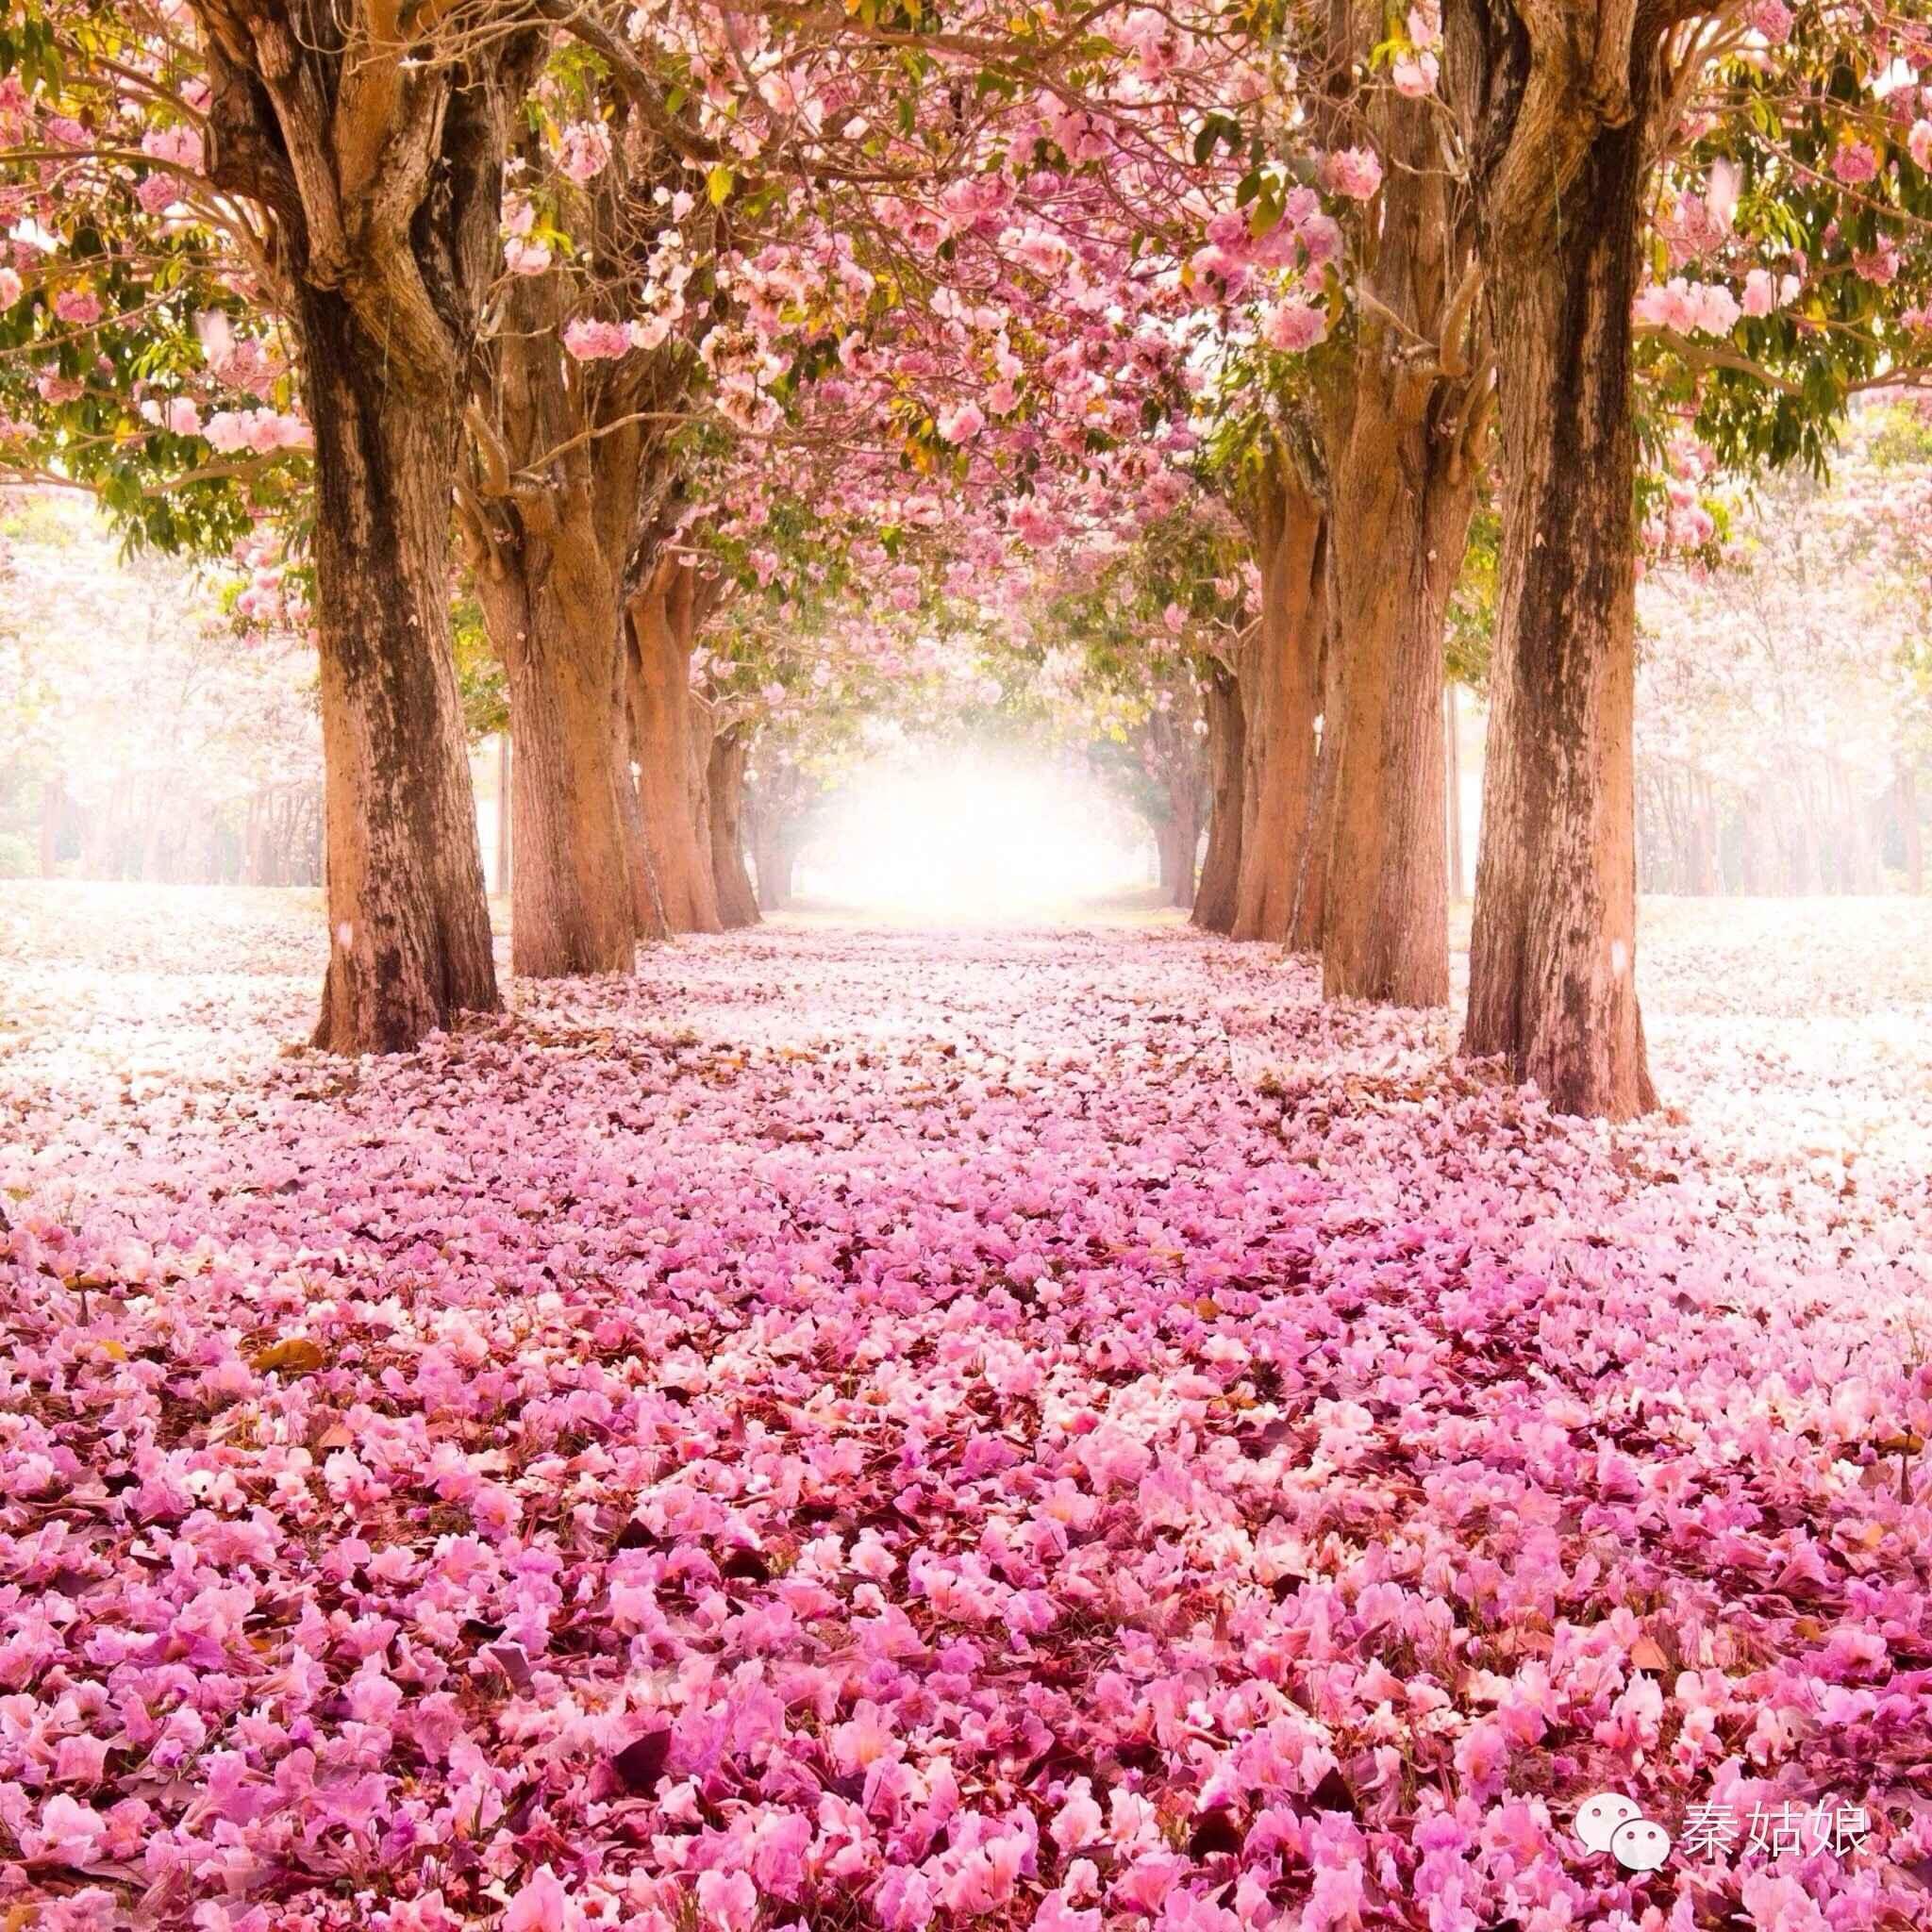 22+ Cherry Blossoms Live Wallpaper - Polamu-cuy